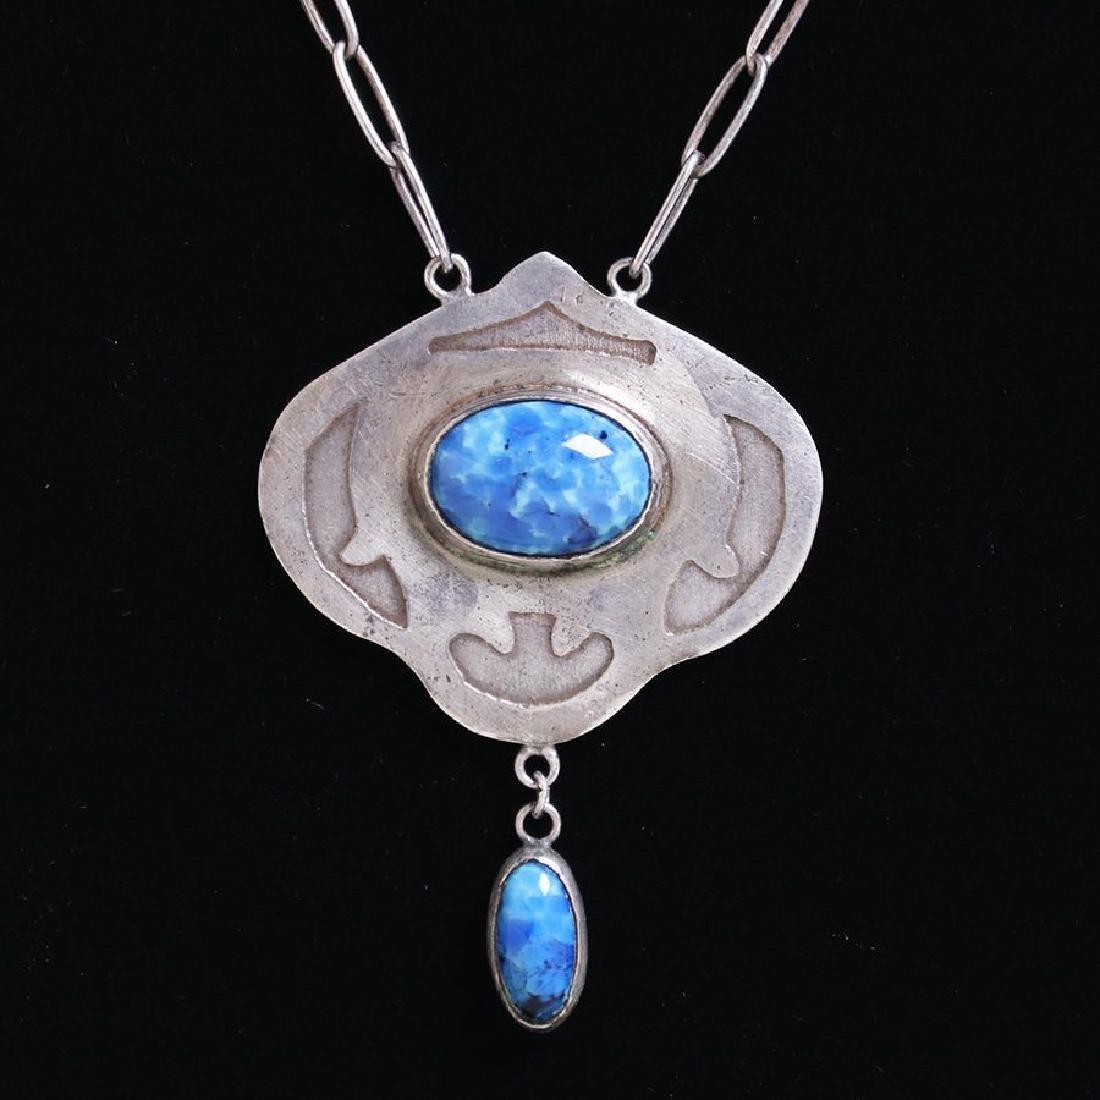 Forest Craft Guild sterling pendant necklace